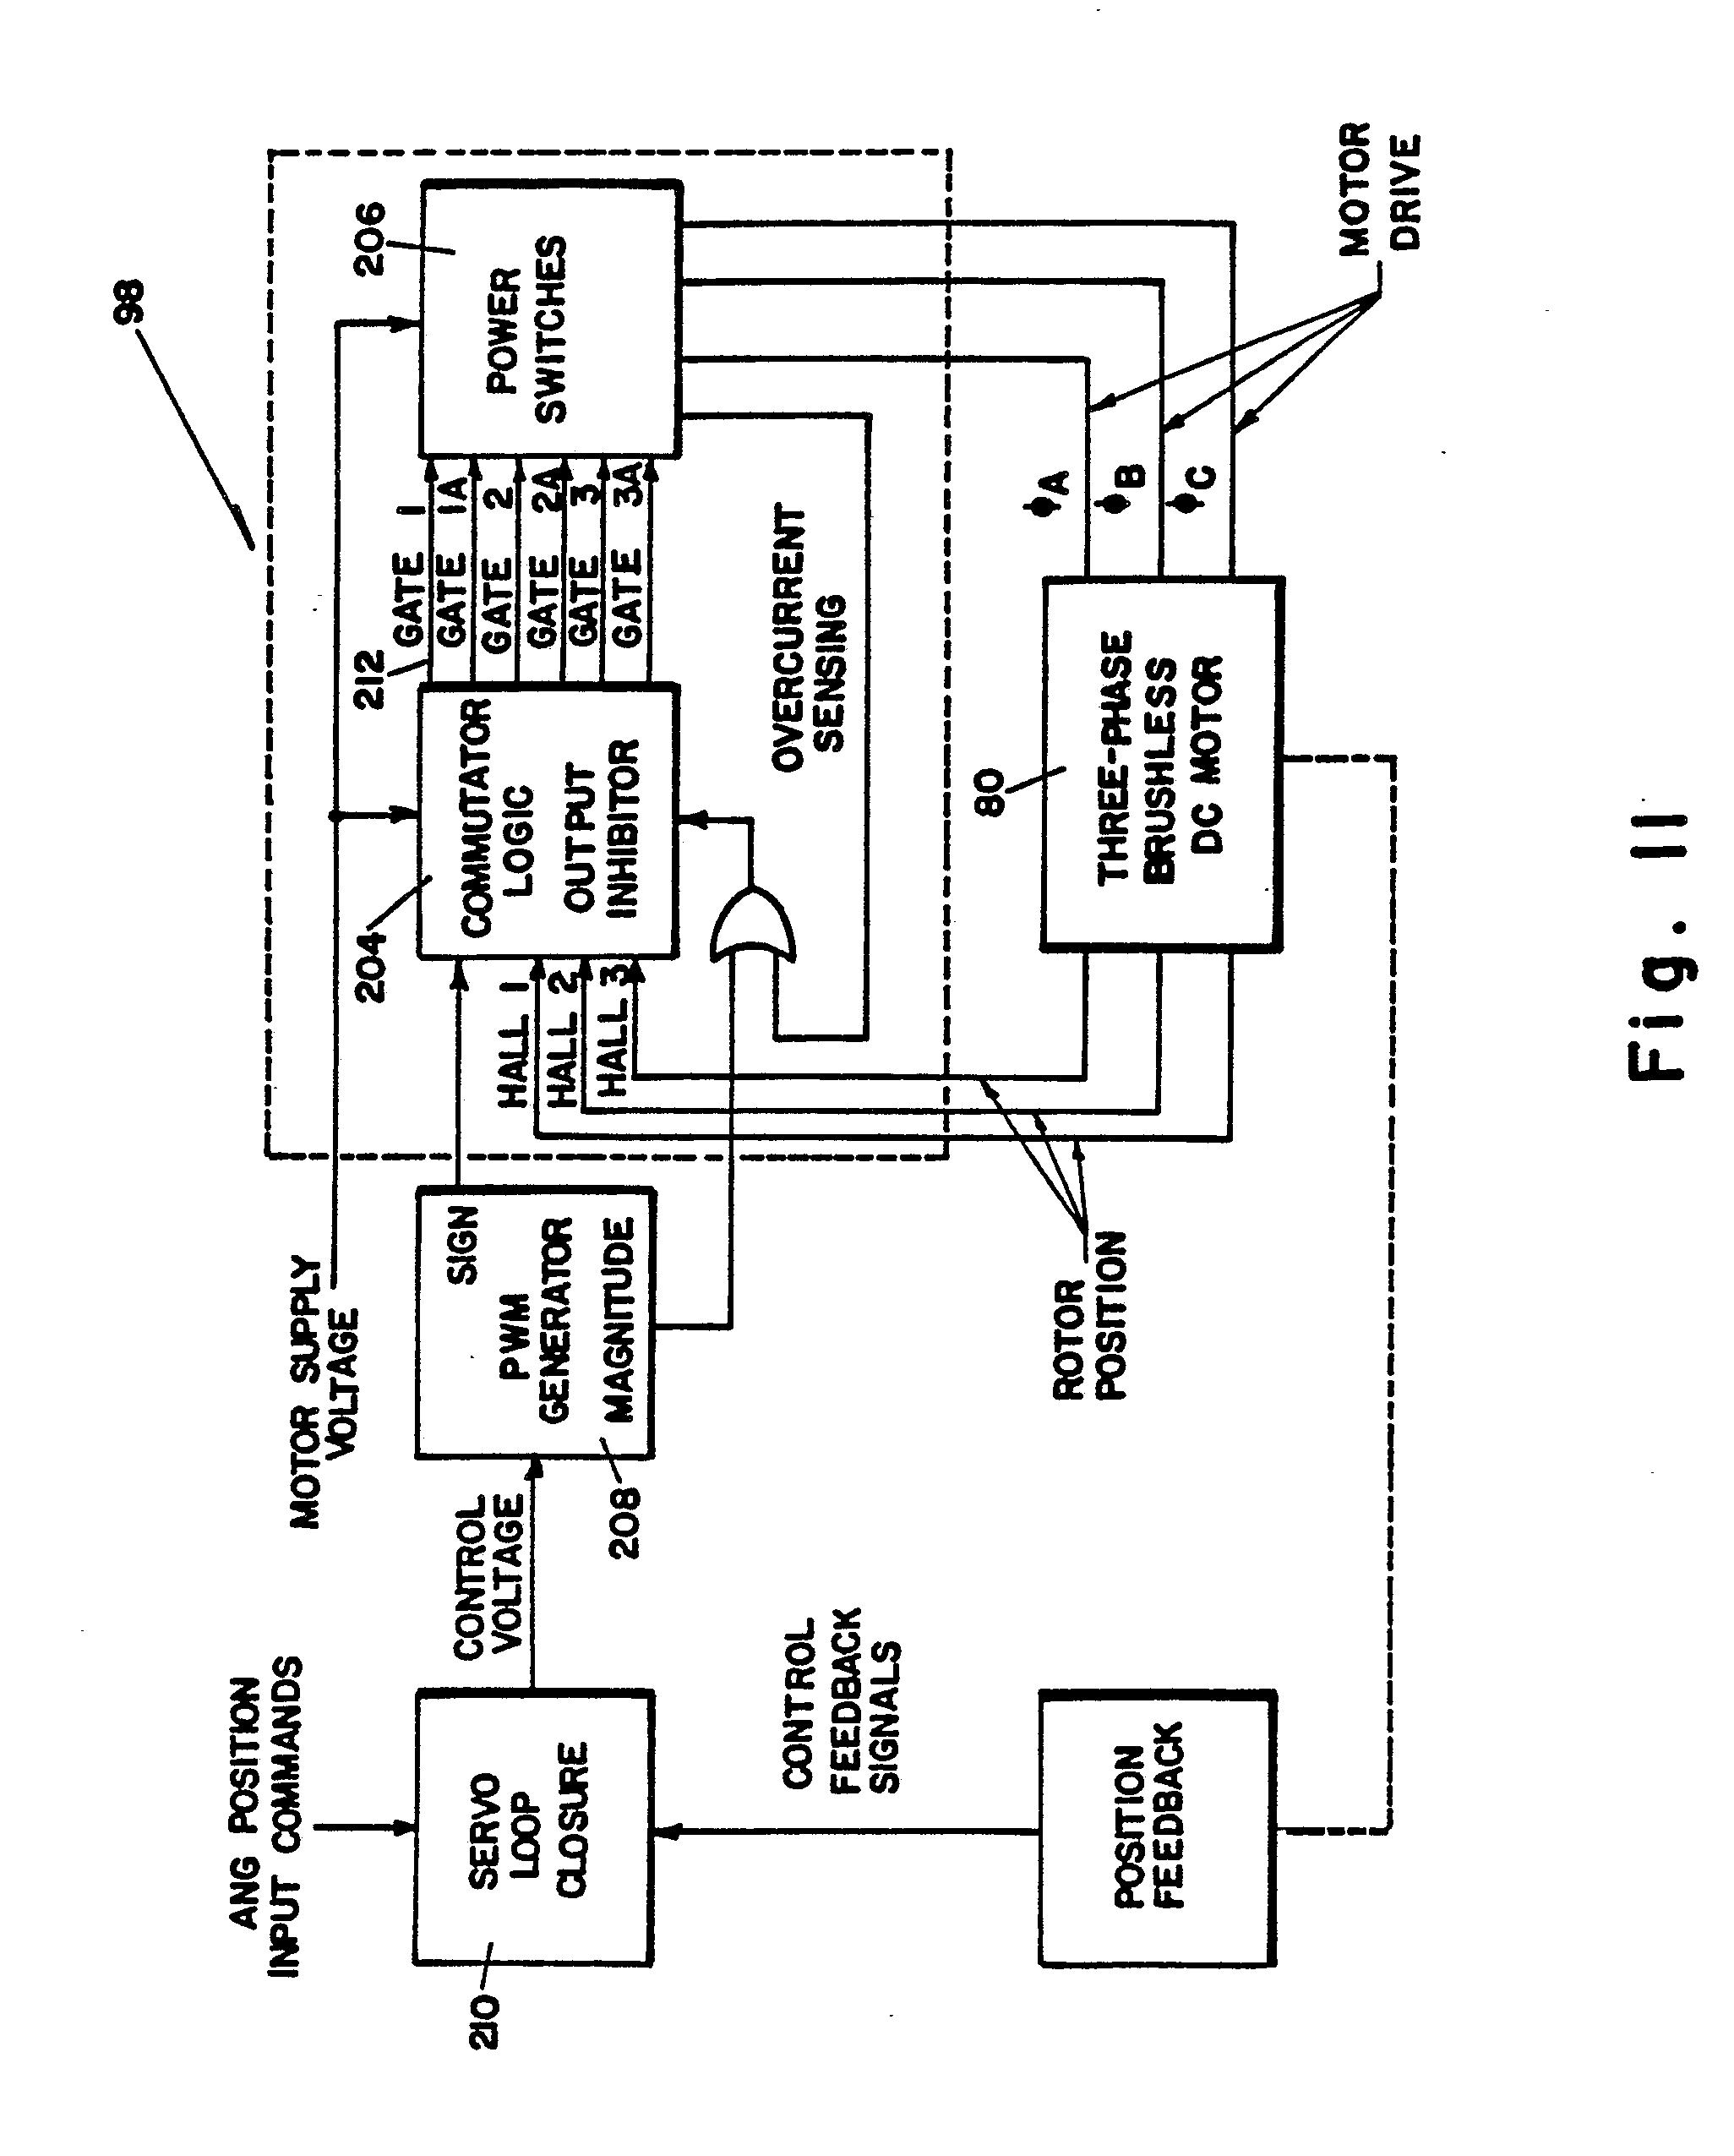 cushman truckster wiring diagram html